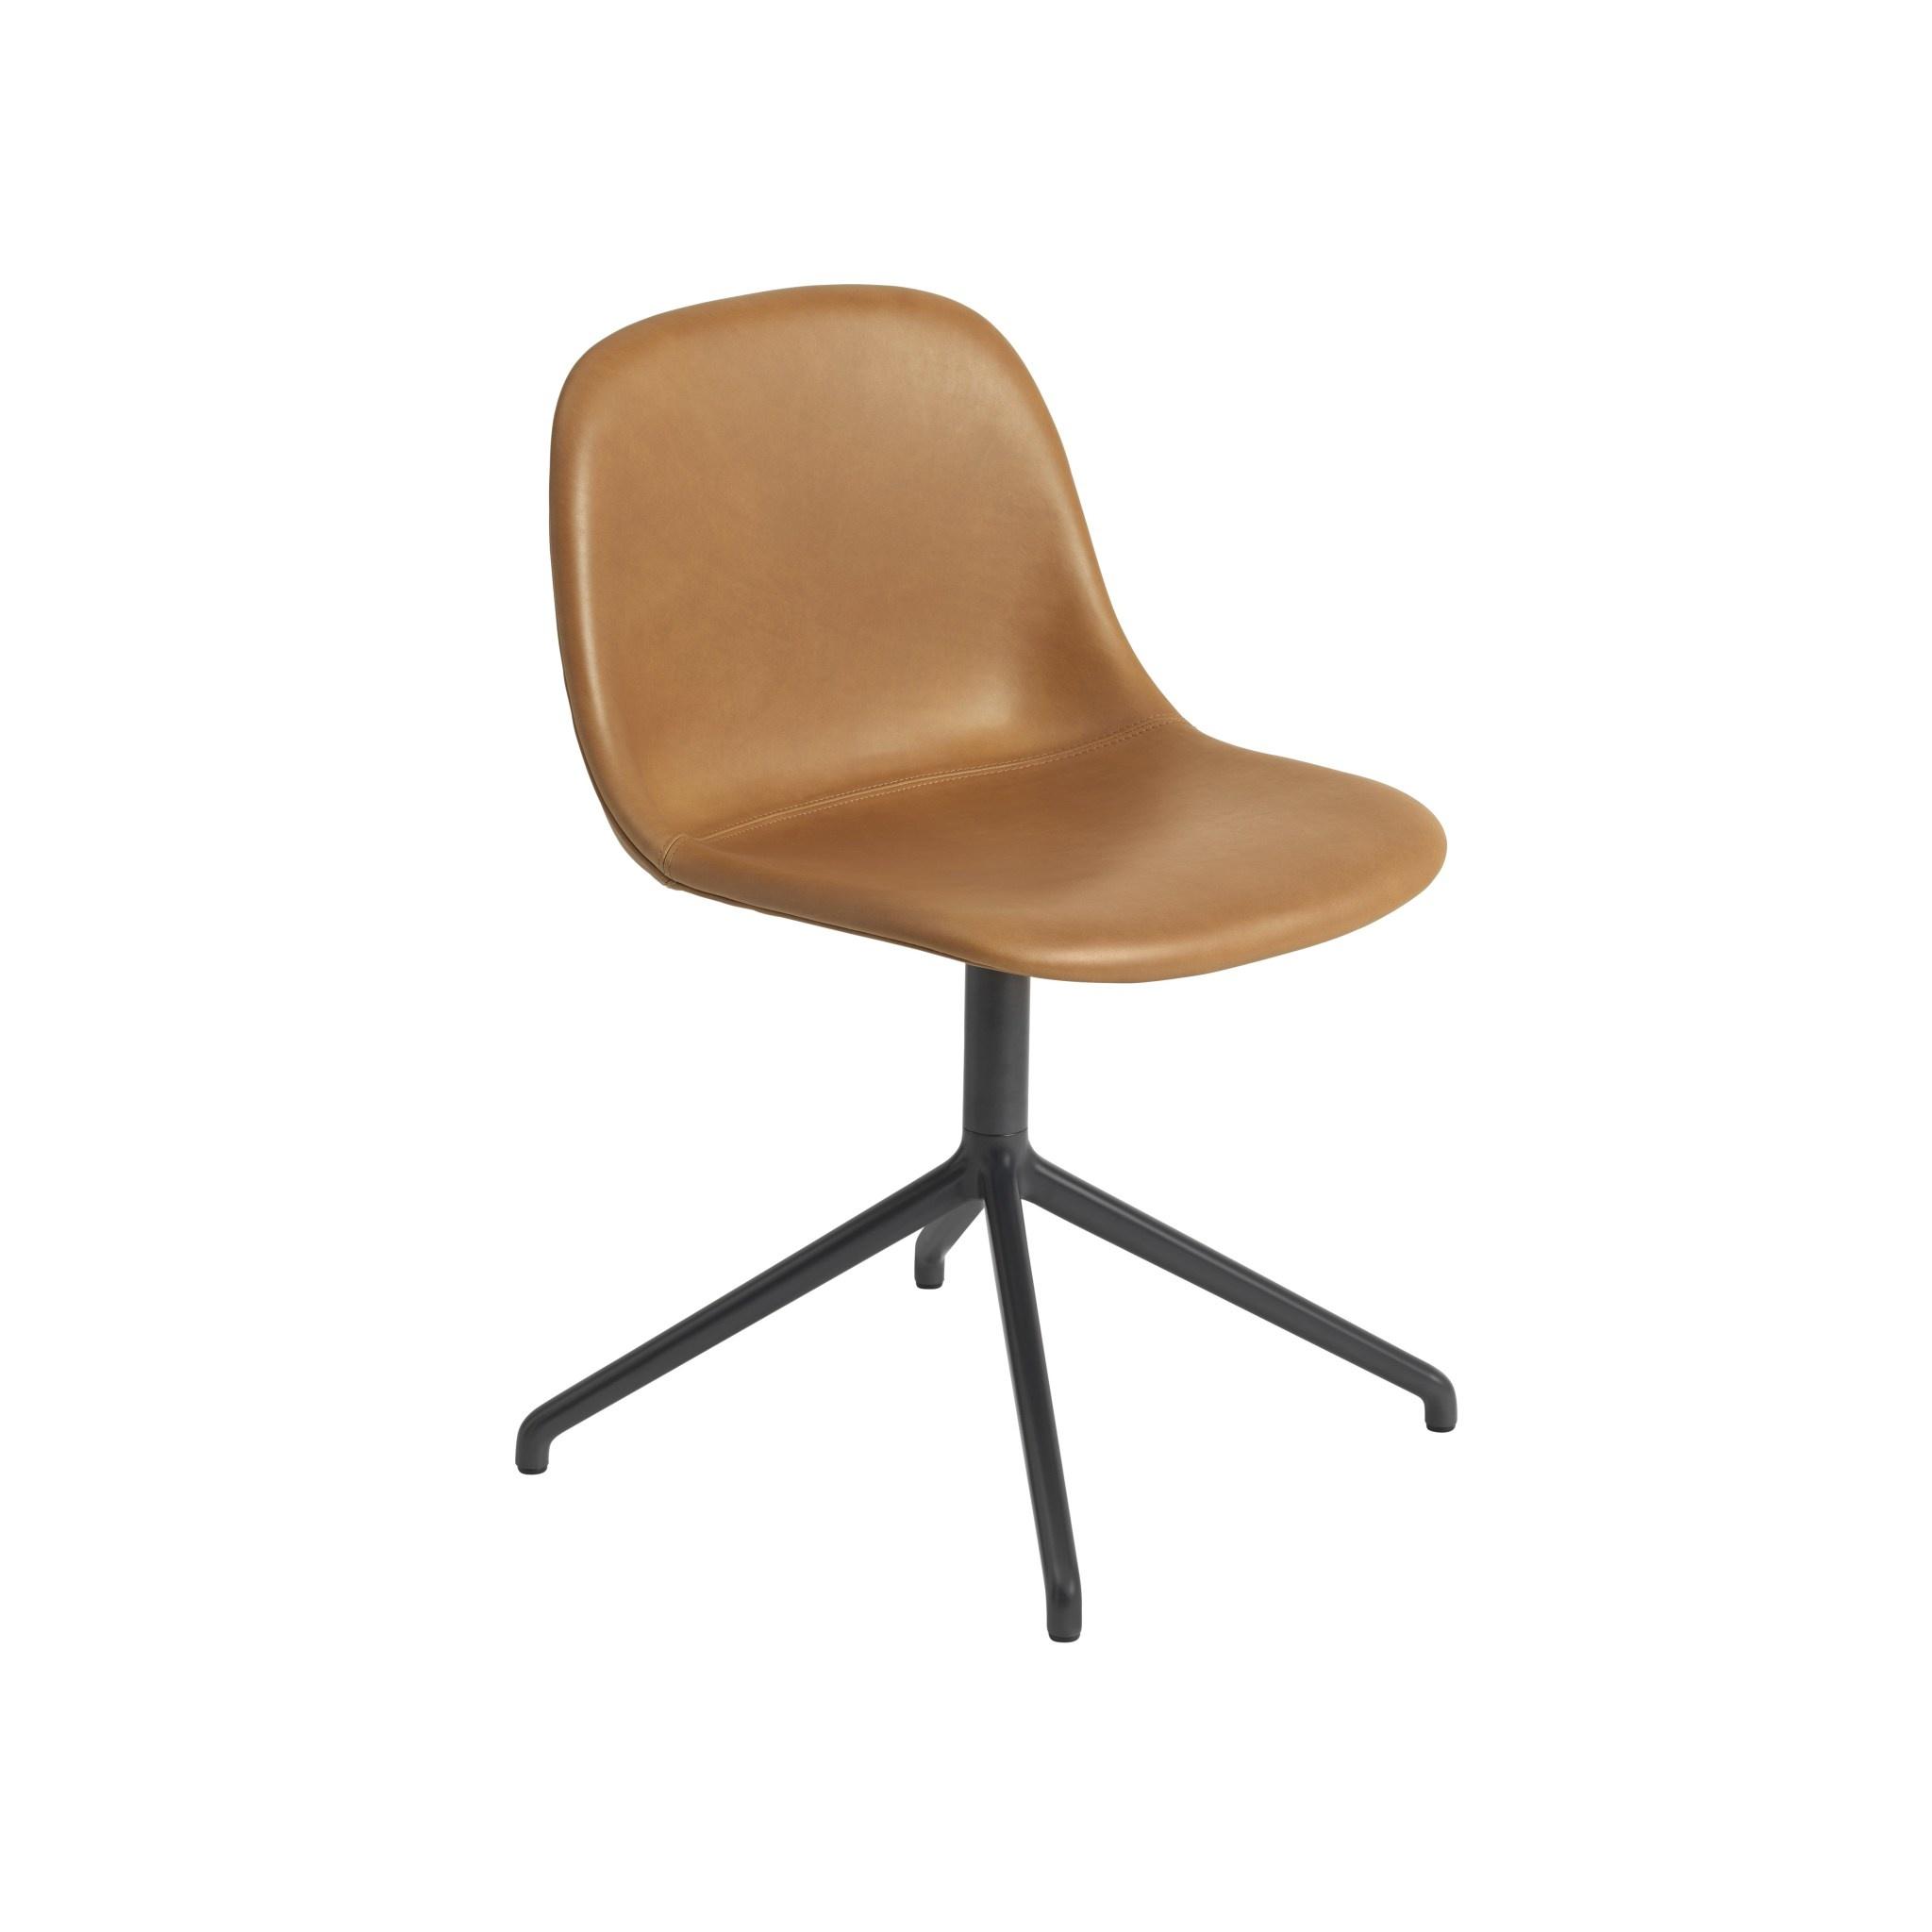 Fiber side chair swivel base w.o. return-11